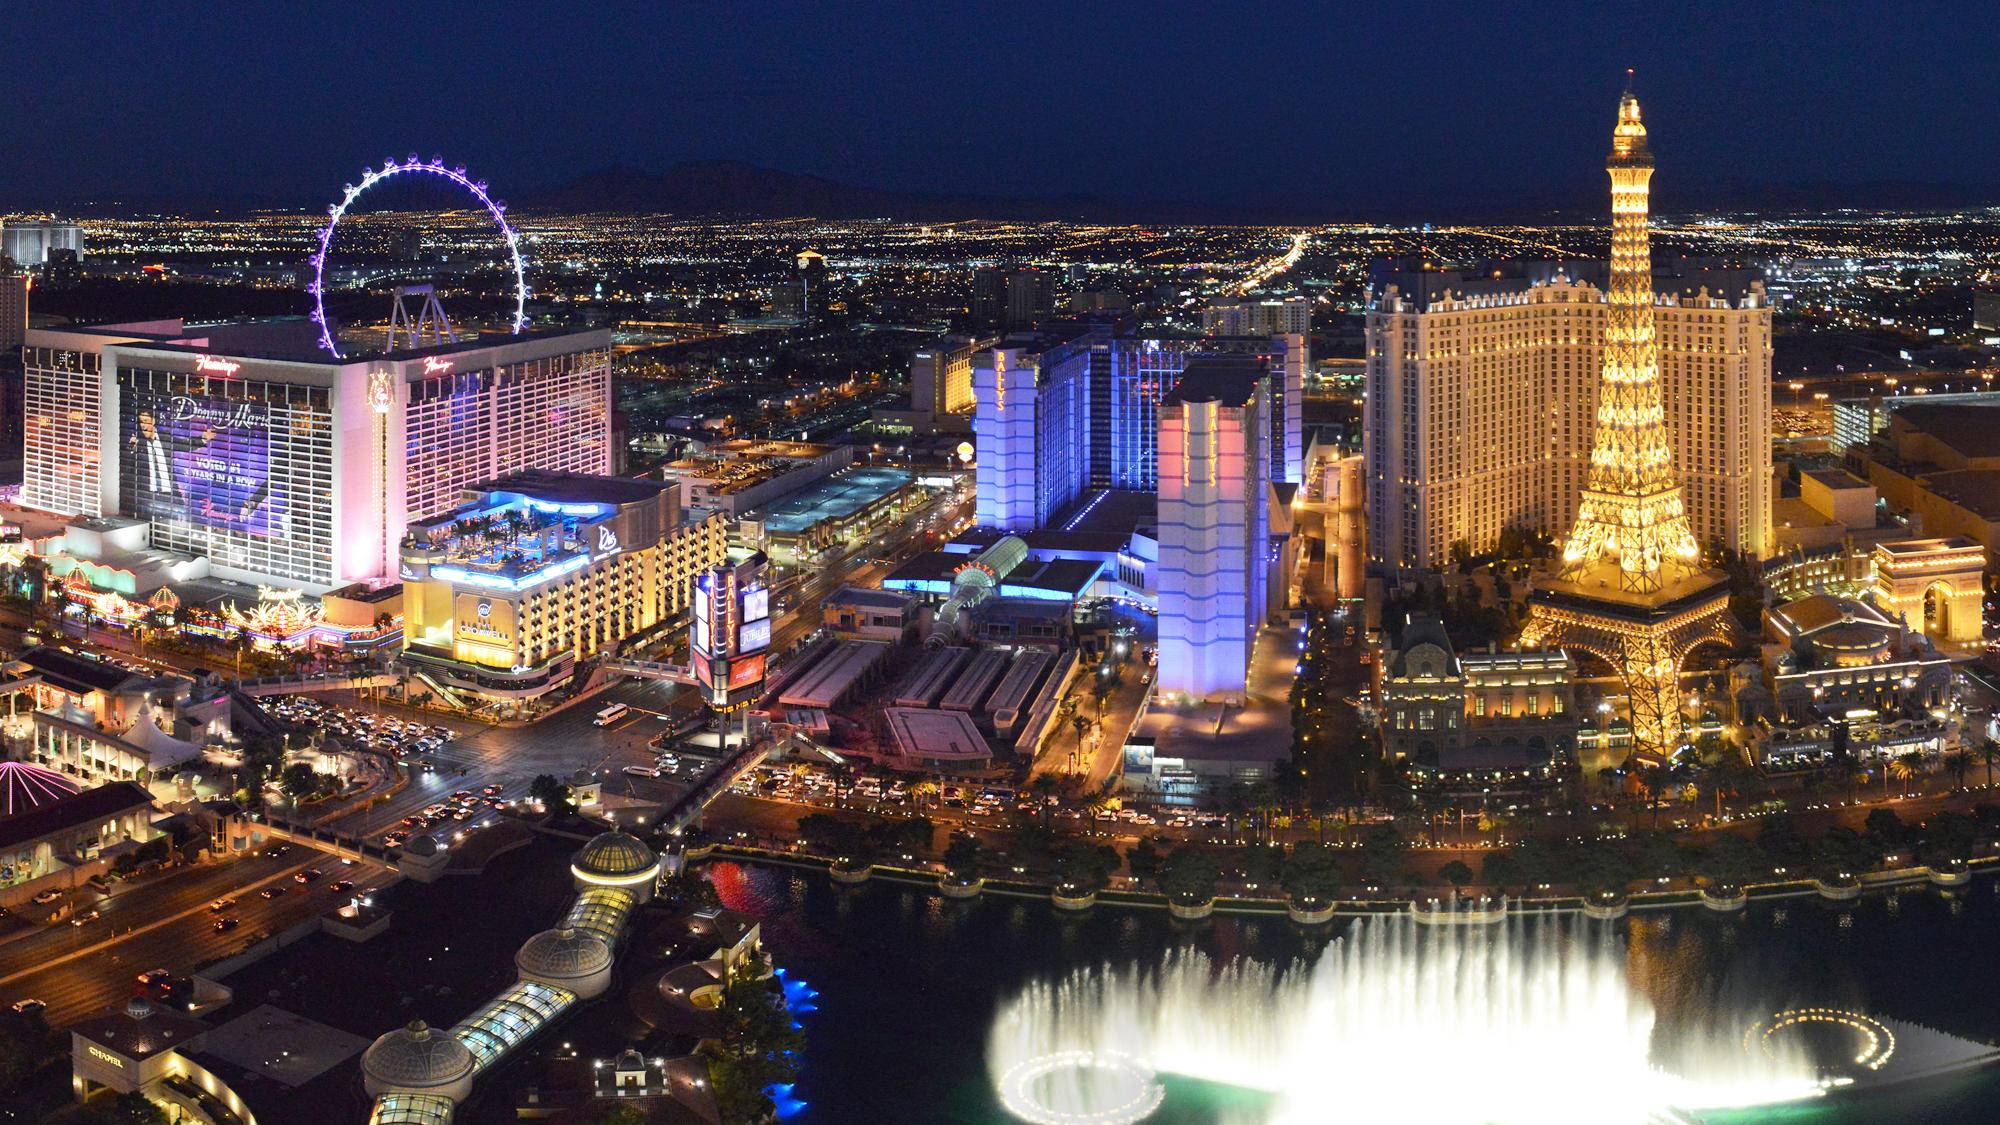 The most popular gambling city in america atlantic casino city harrahs hotel